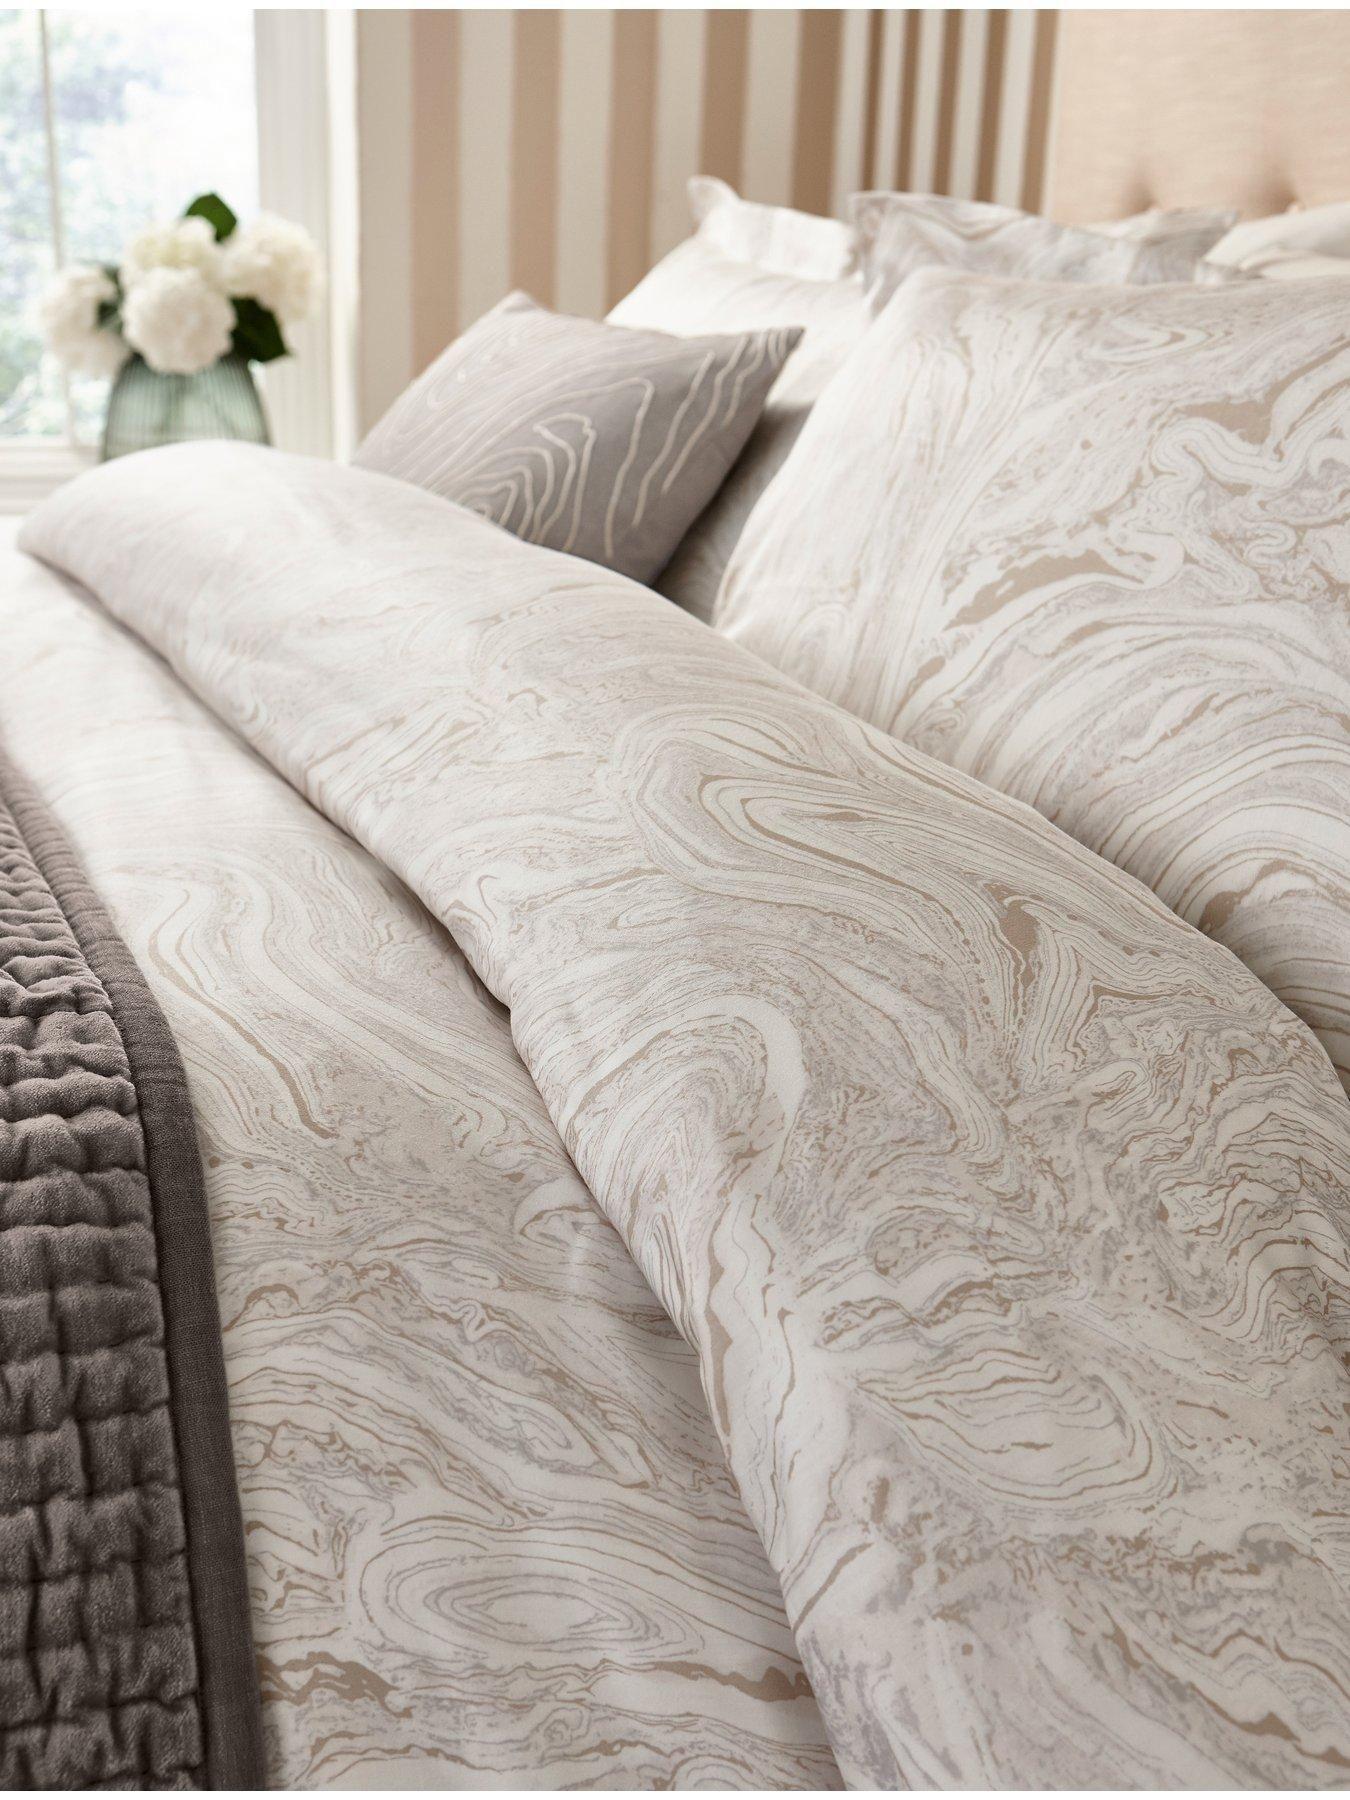 Harlequin Makrana Cotton Sateen 200 Thread Count Duvet Cover